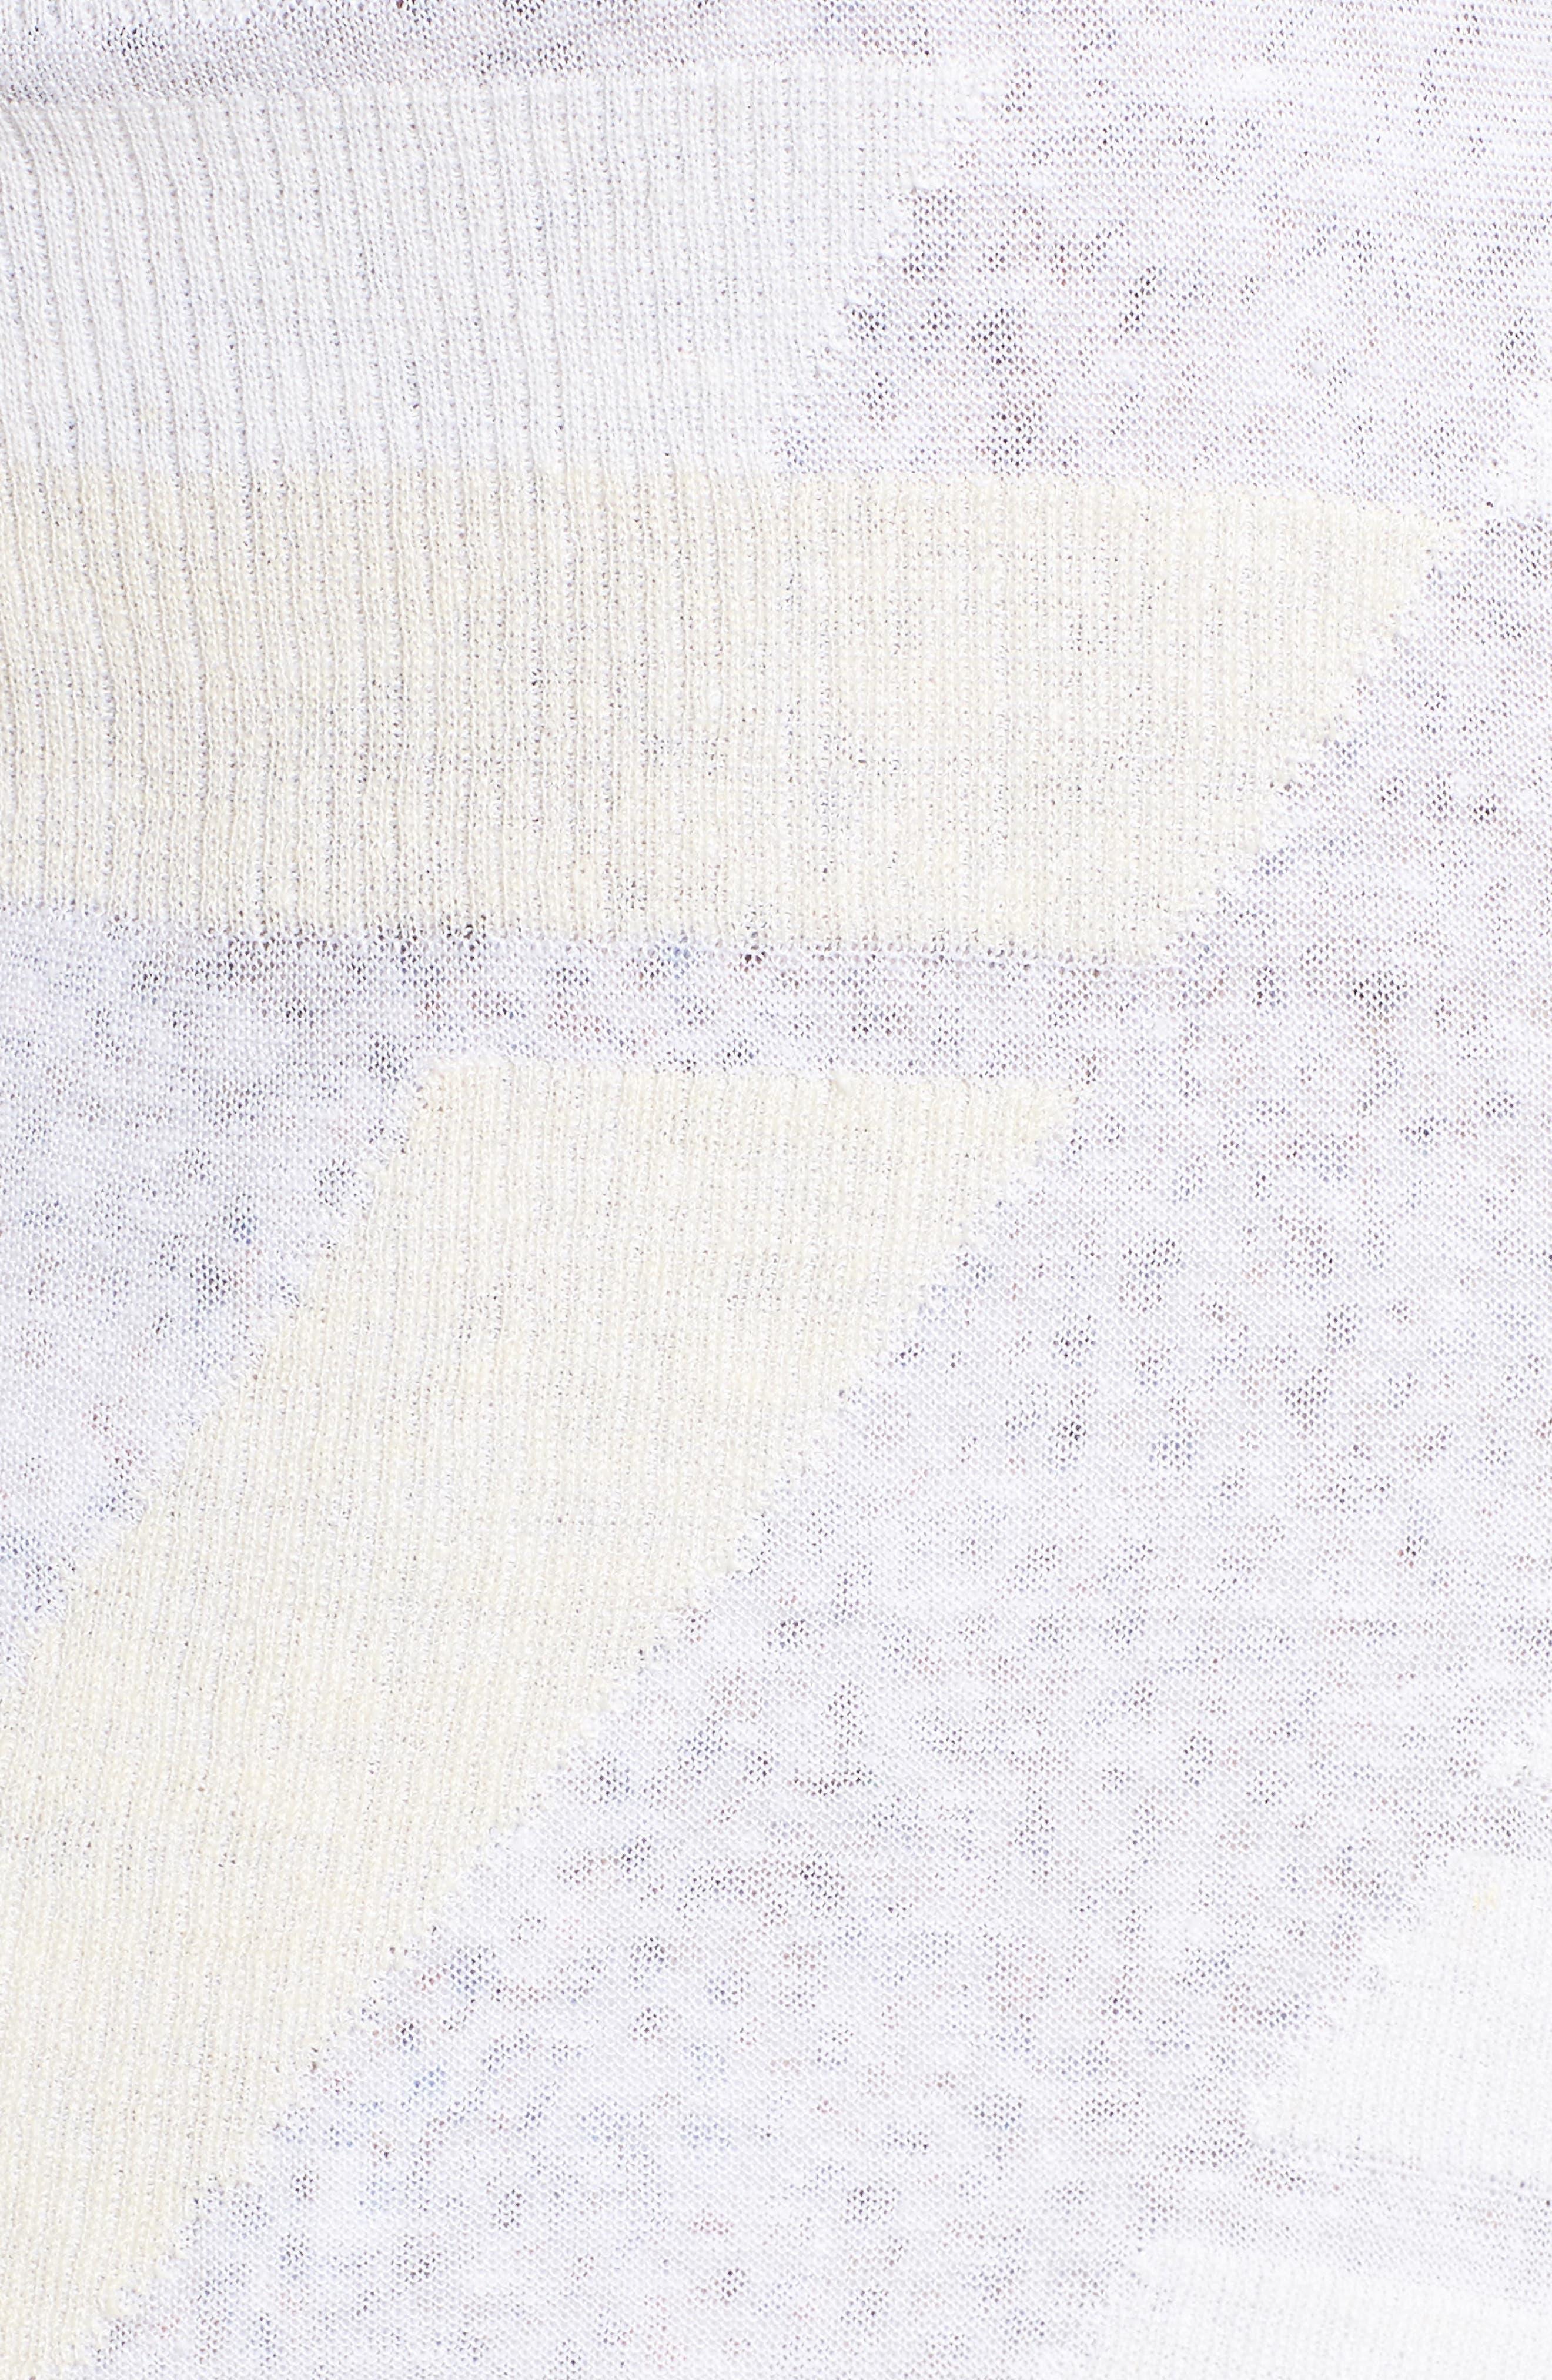 Sunlight Chiffon Trim Linen Blend Cardigan,                             Alternate thumbnail 5, color,                             MULTI